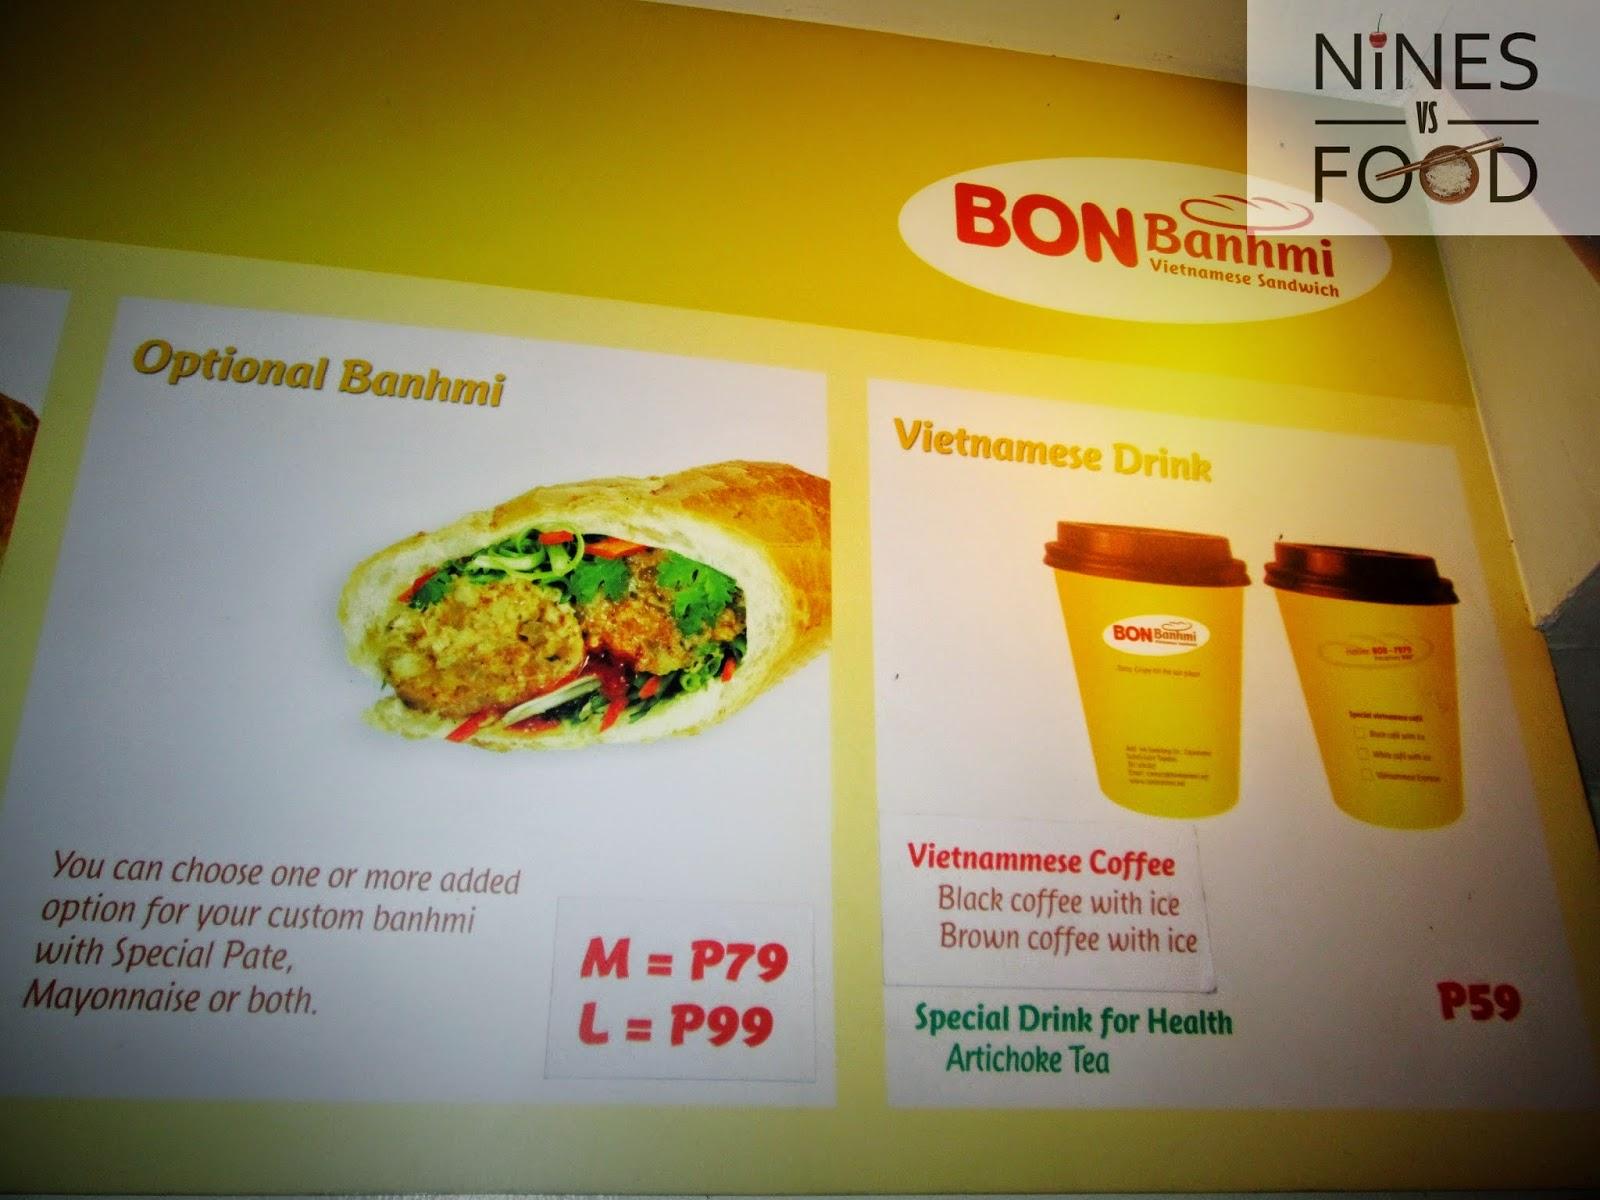 Nines vs. Food - Bon Banhmi Makati-5.jpg